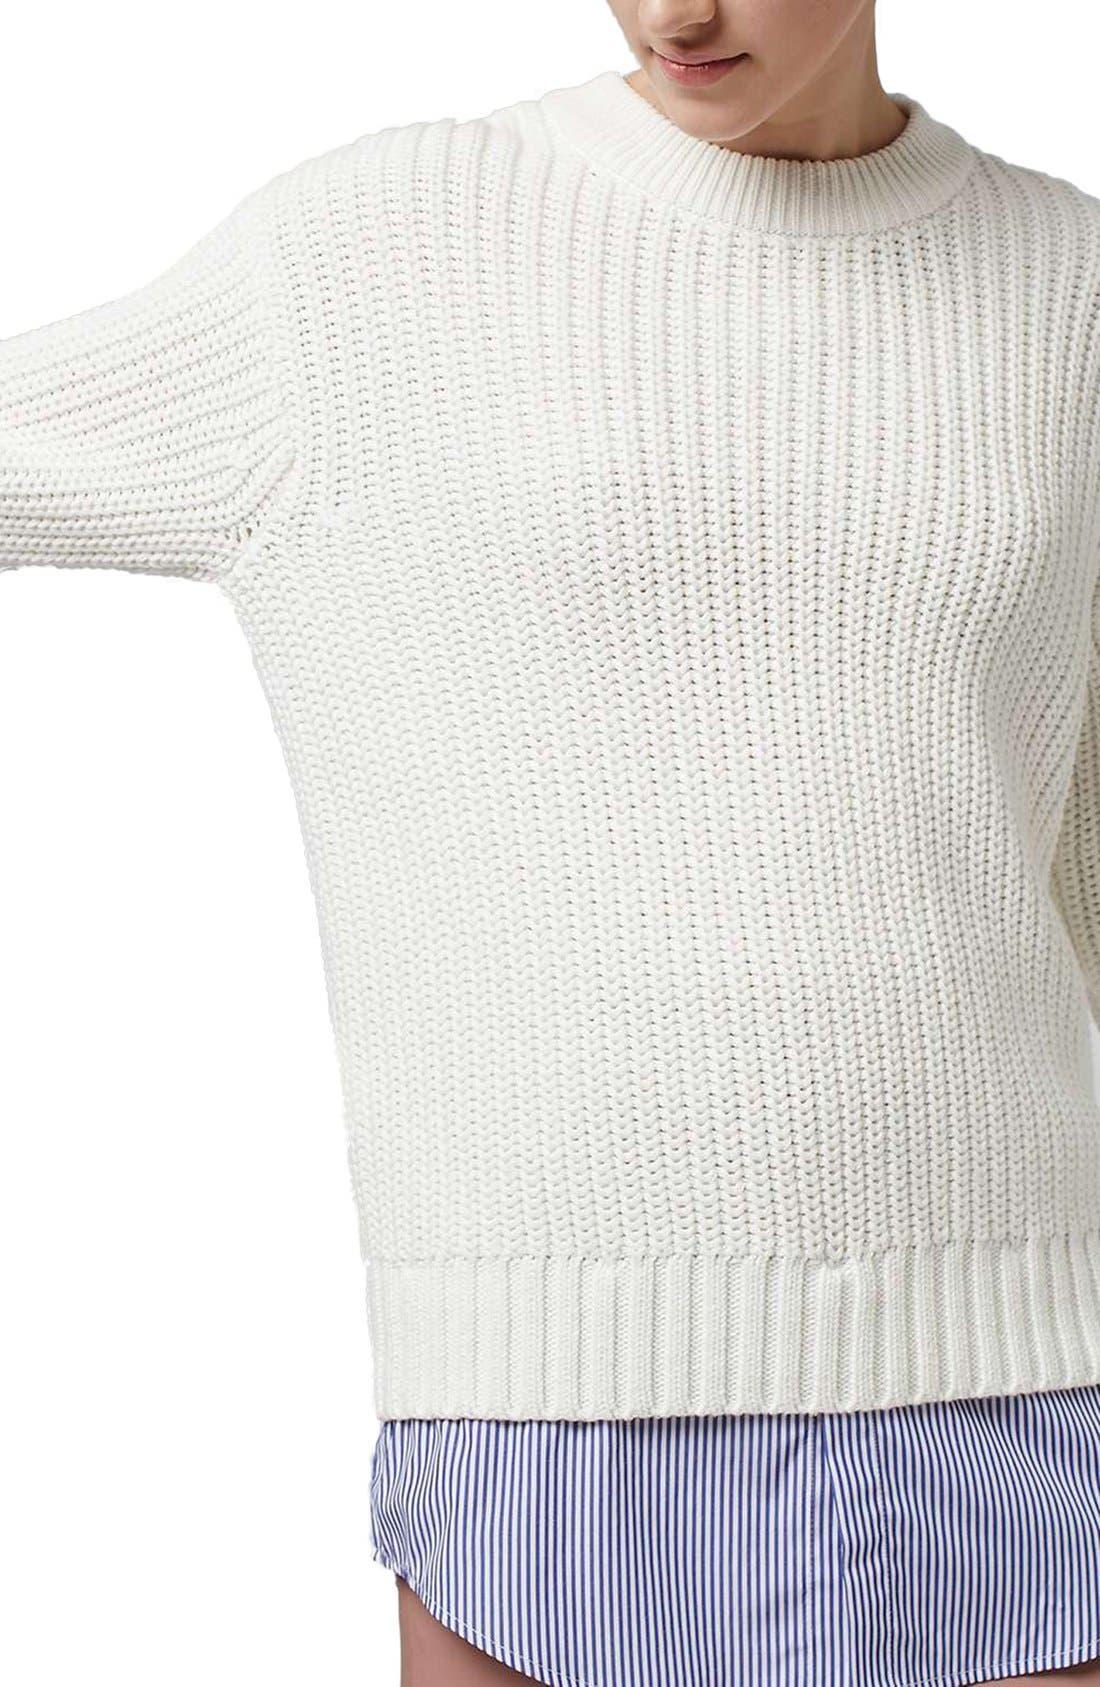 Alternate Image 4  - Topshop Boutique Shirttail Hem Ribbed Sweater